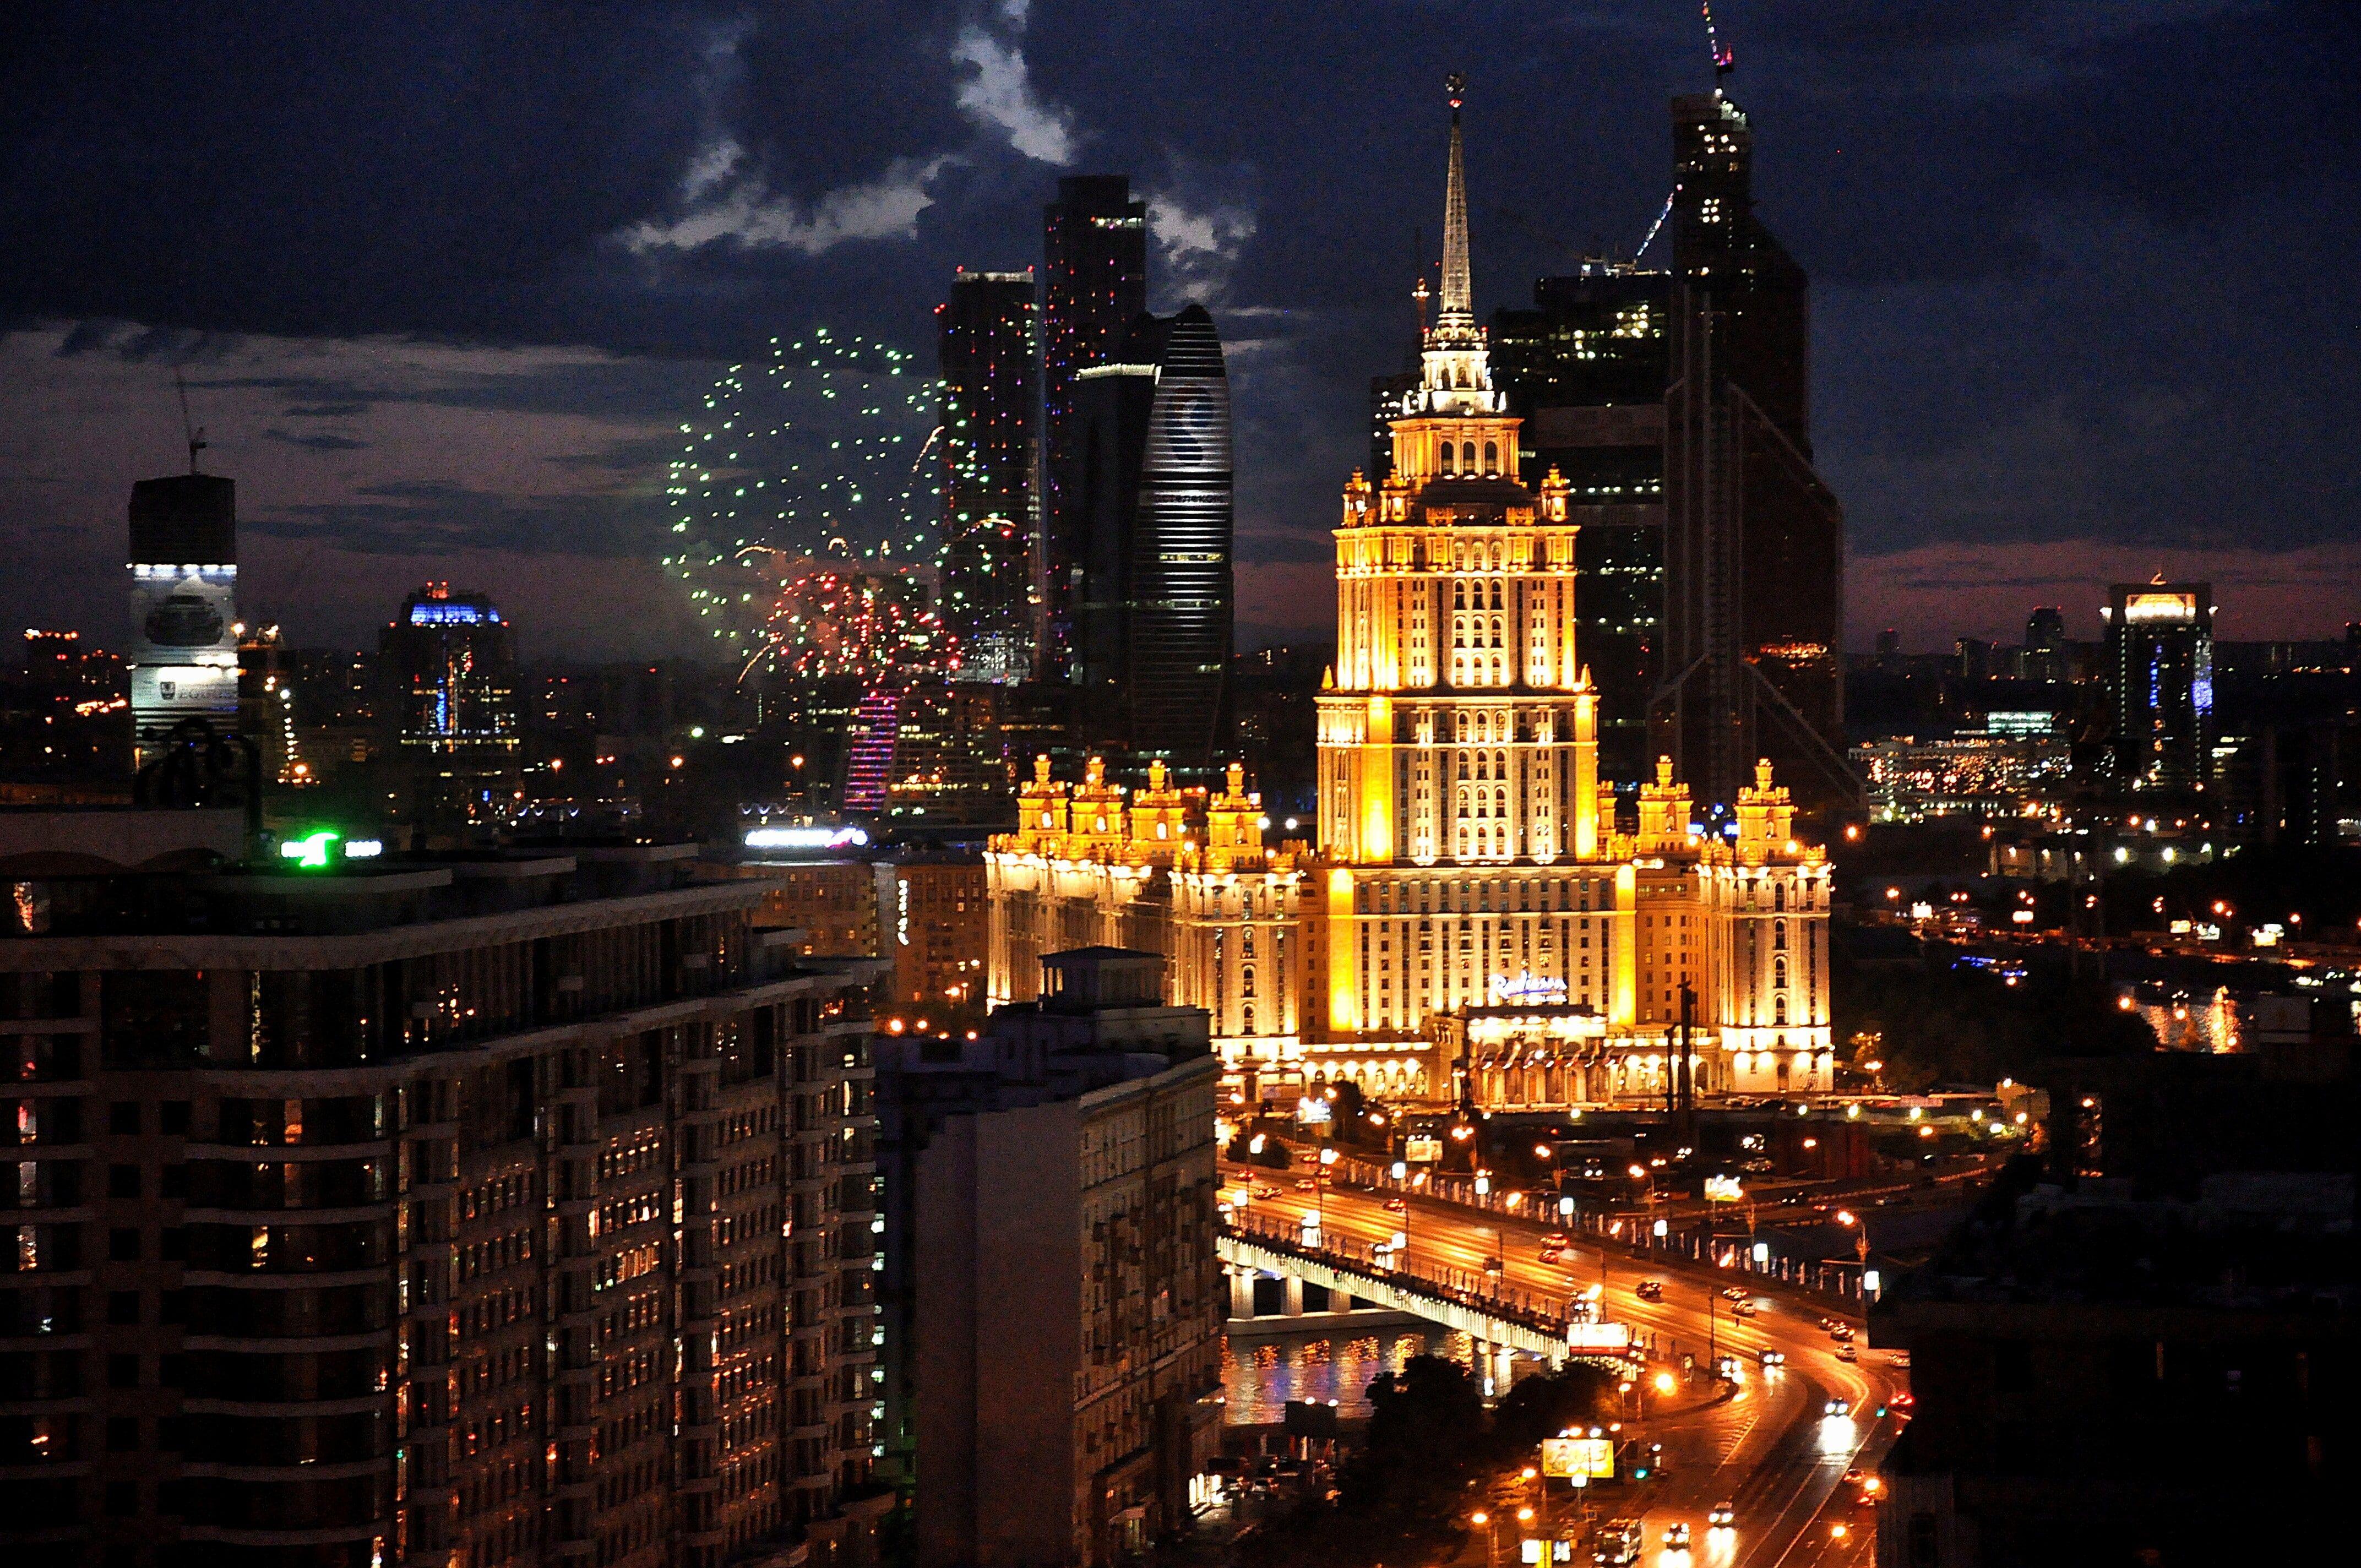 Russia Night In Moscow Moscow Night Light Night 4k Wallpaper Hdwallpaper Desktop Gorod Rossiya Puteshestviya